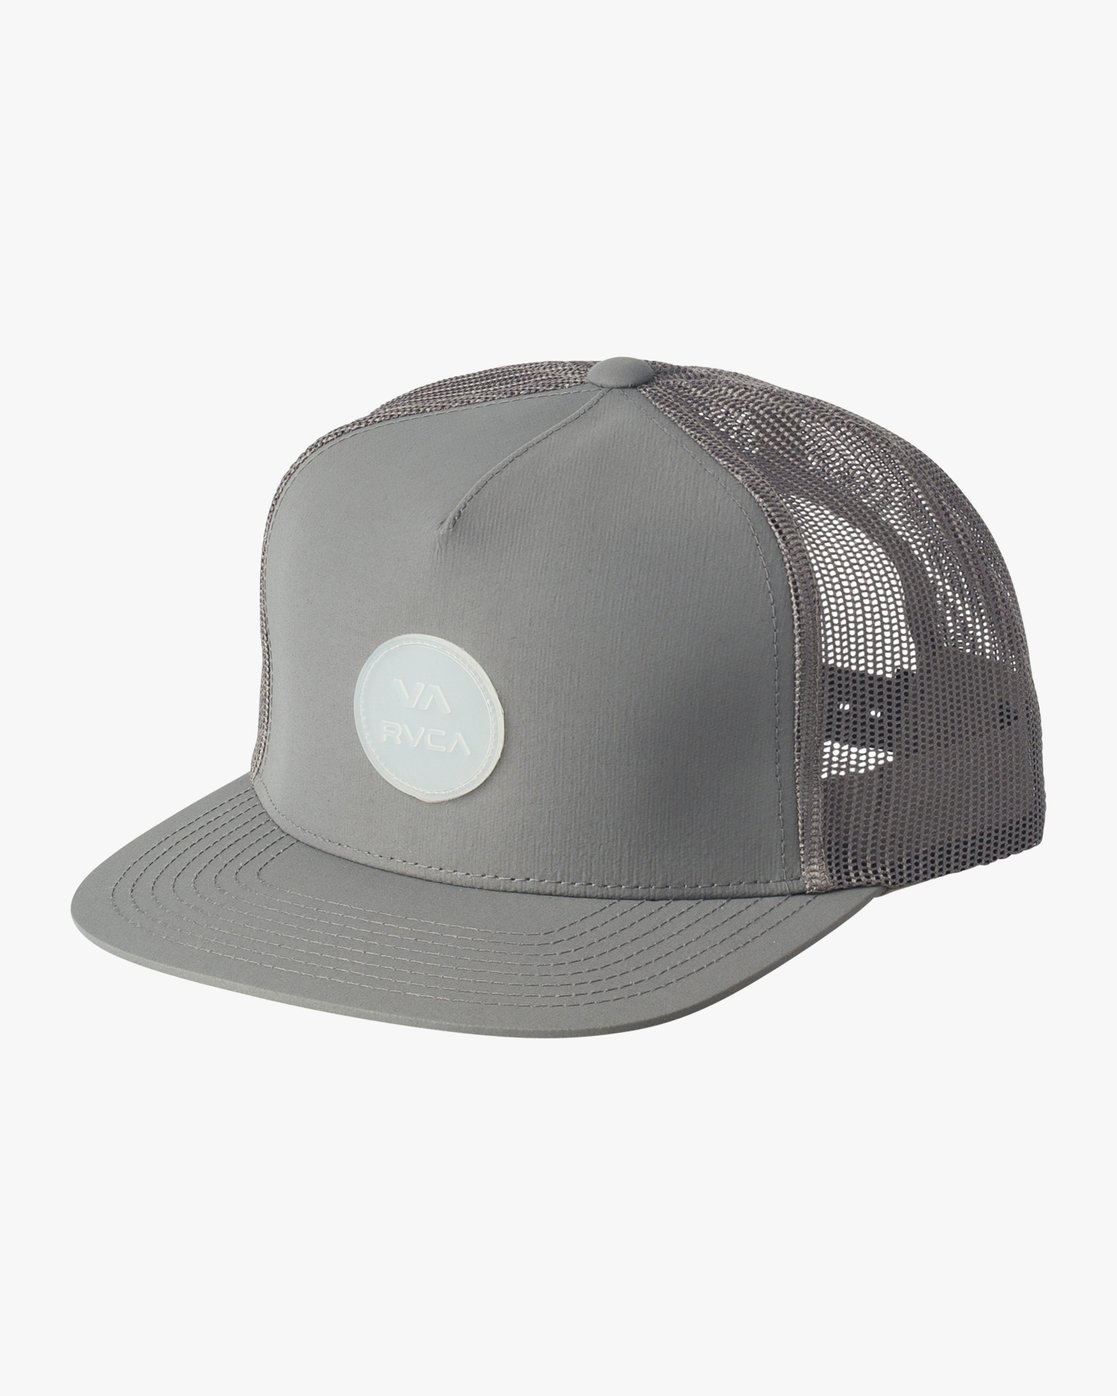 0 RVCA Sphere Trucker Hat Grey MAHWVRRS RVCA